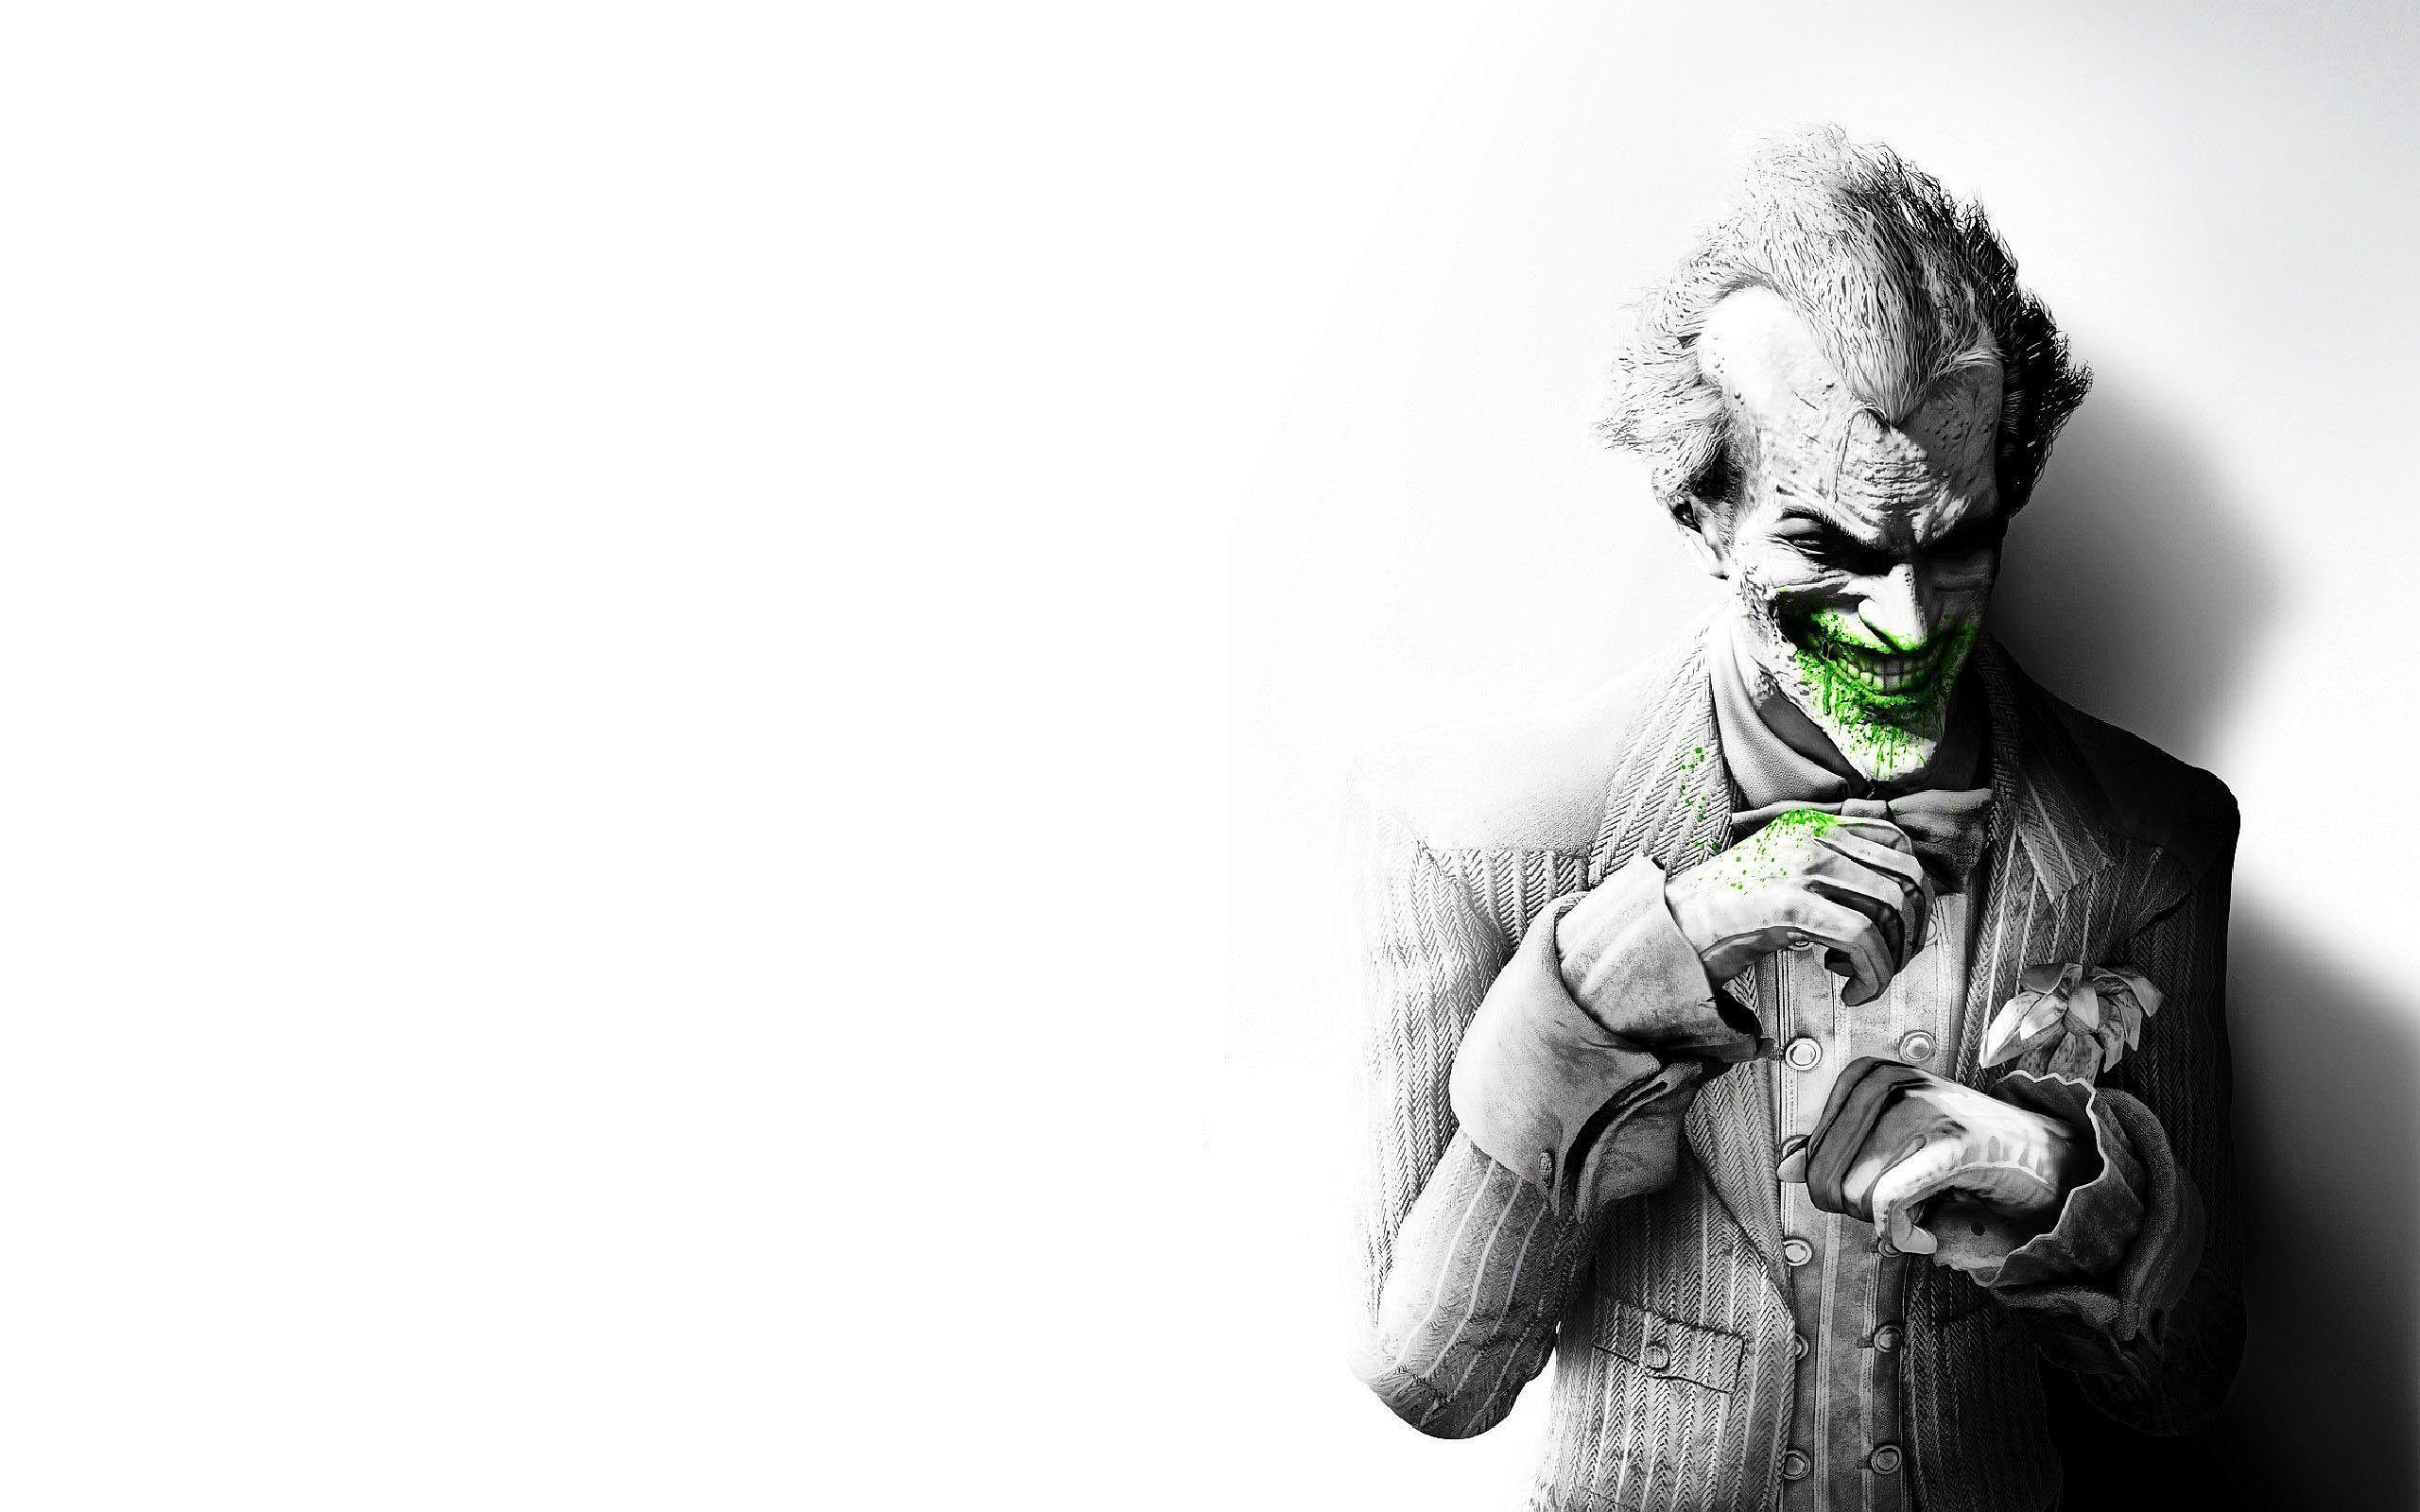 Wallpaper download joker - Joker Wallpaper Hd 1080p Download